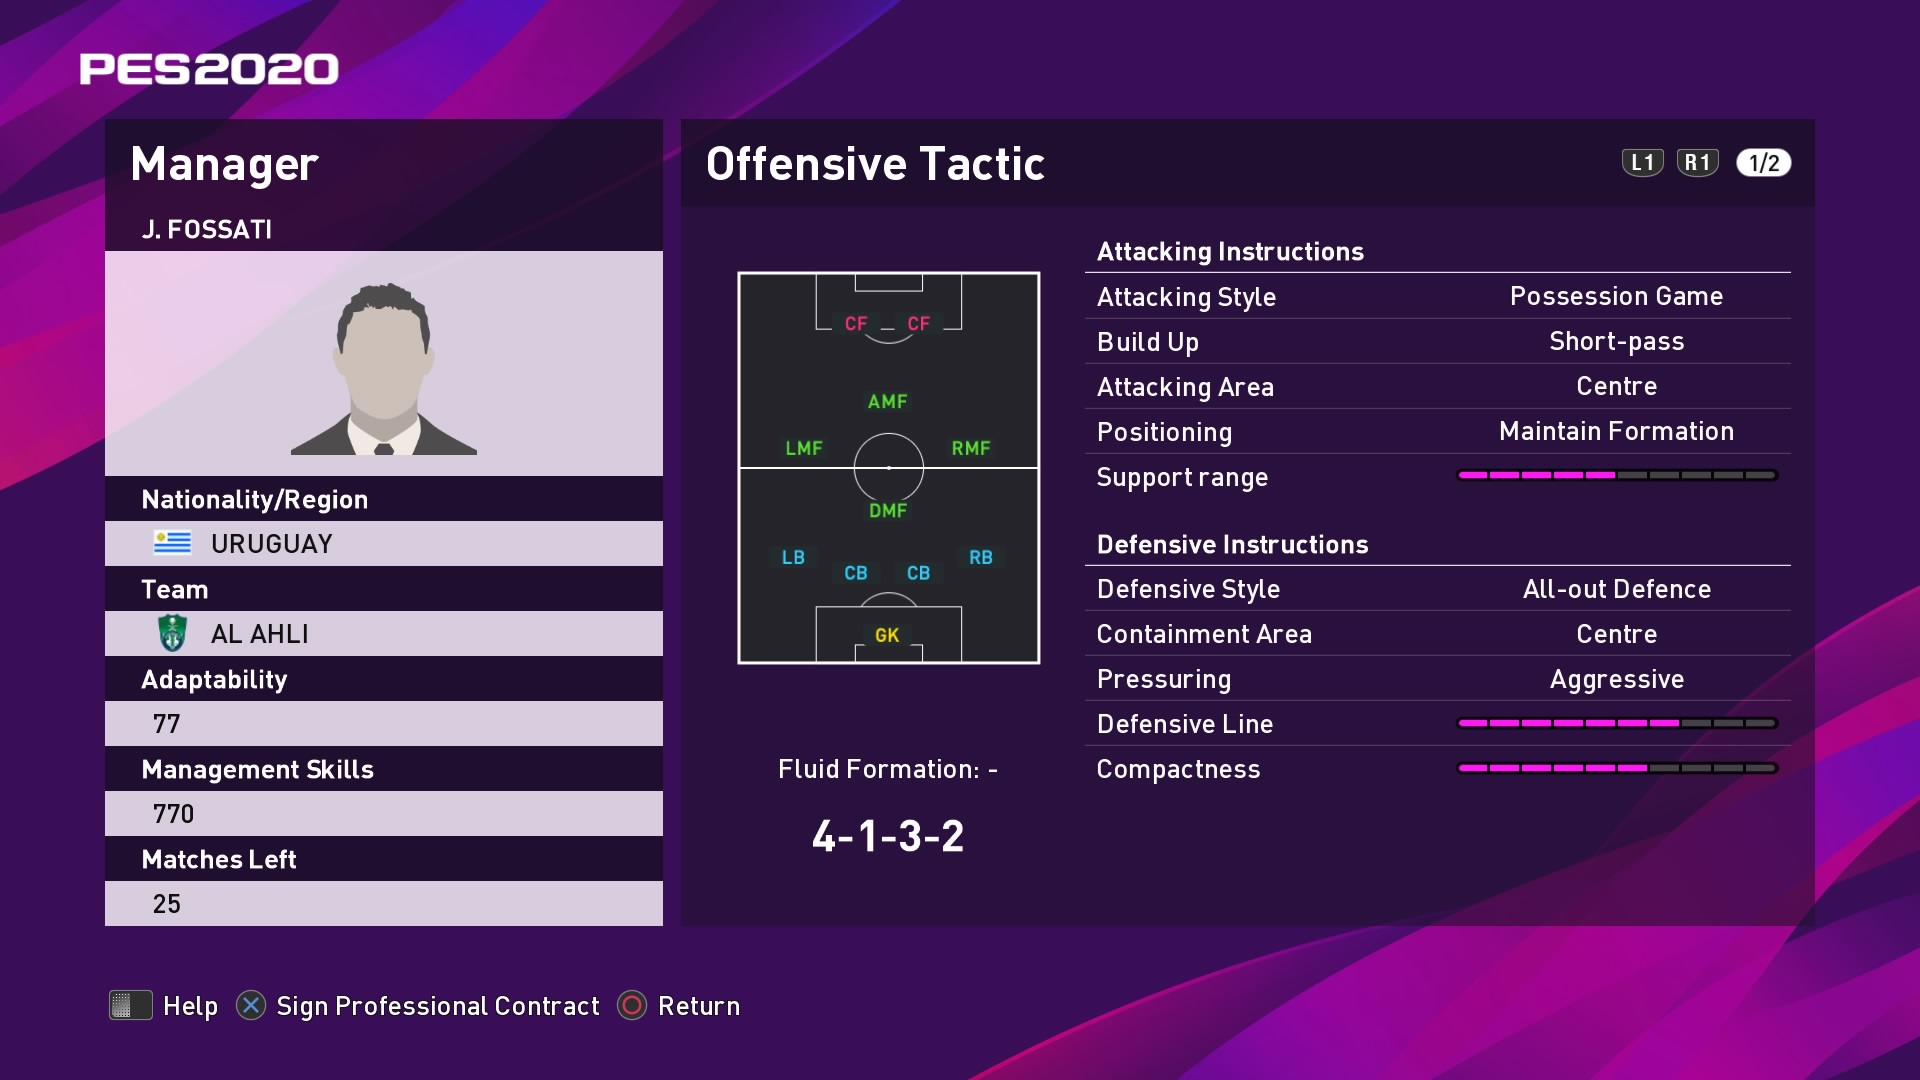 J. Fossati (Jorge Fossati) Offensive Tactic in PES 2020 myClub